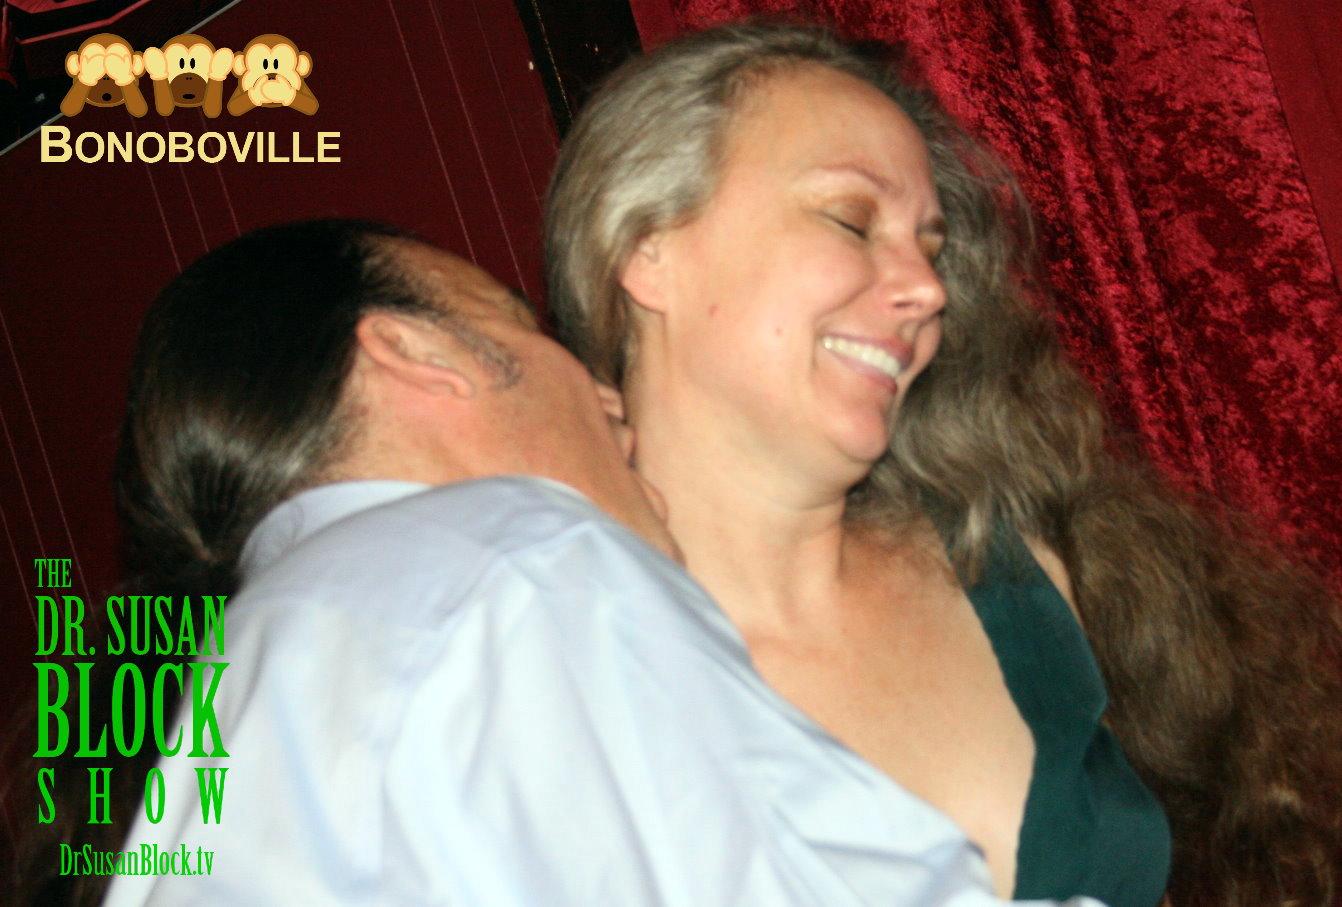 Michaels & Johnson take Bonoboville Communion. Photo: L'Erotique